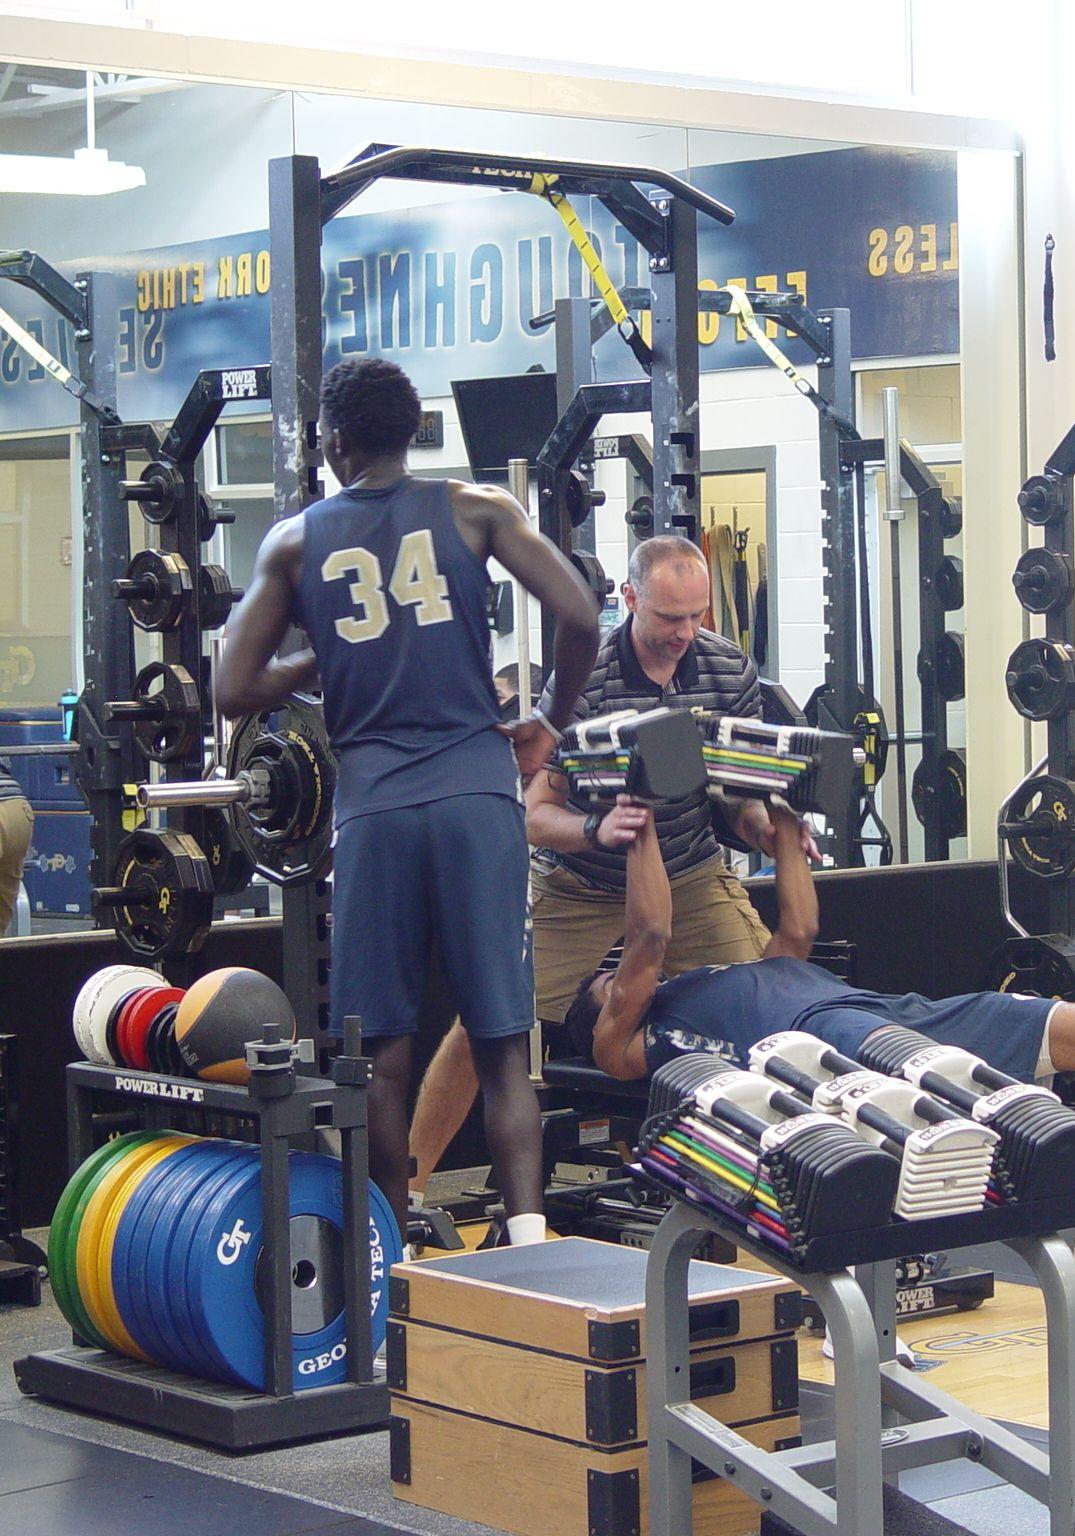 Player development coach Dan Taylor takes the Georgia Tech men's basketball team through a workout on June 16, 2016 in the Zelnak Center weight room.